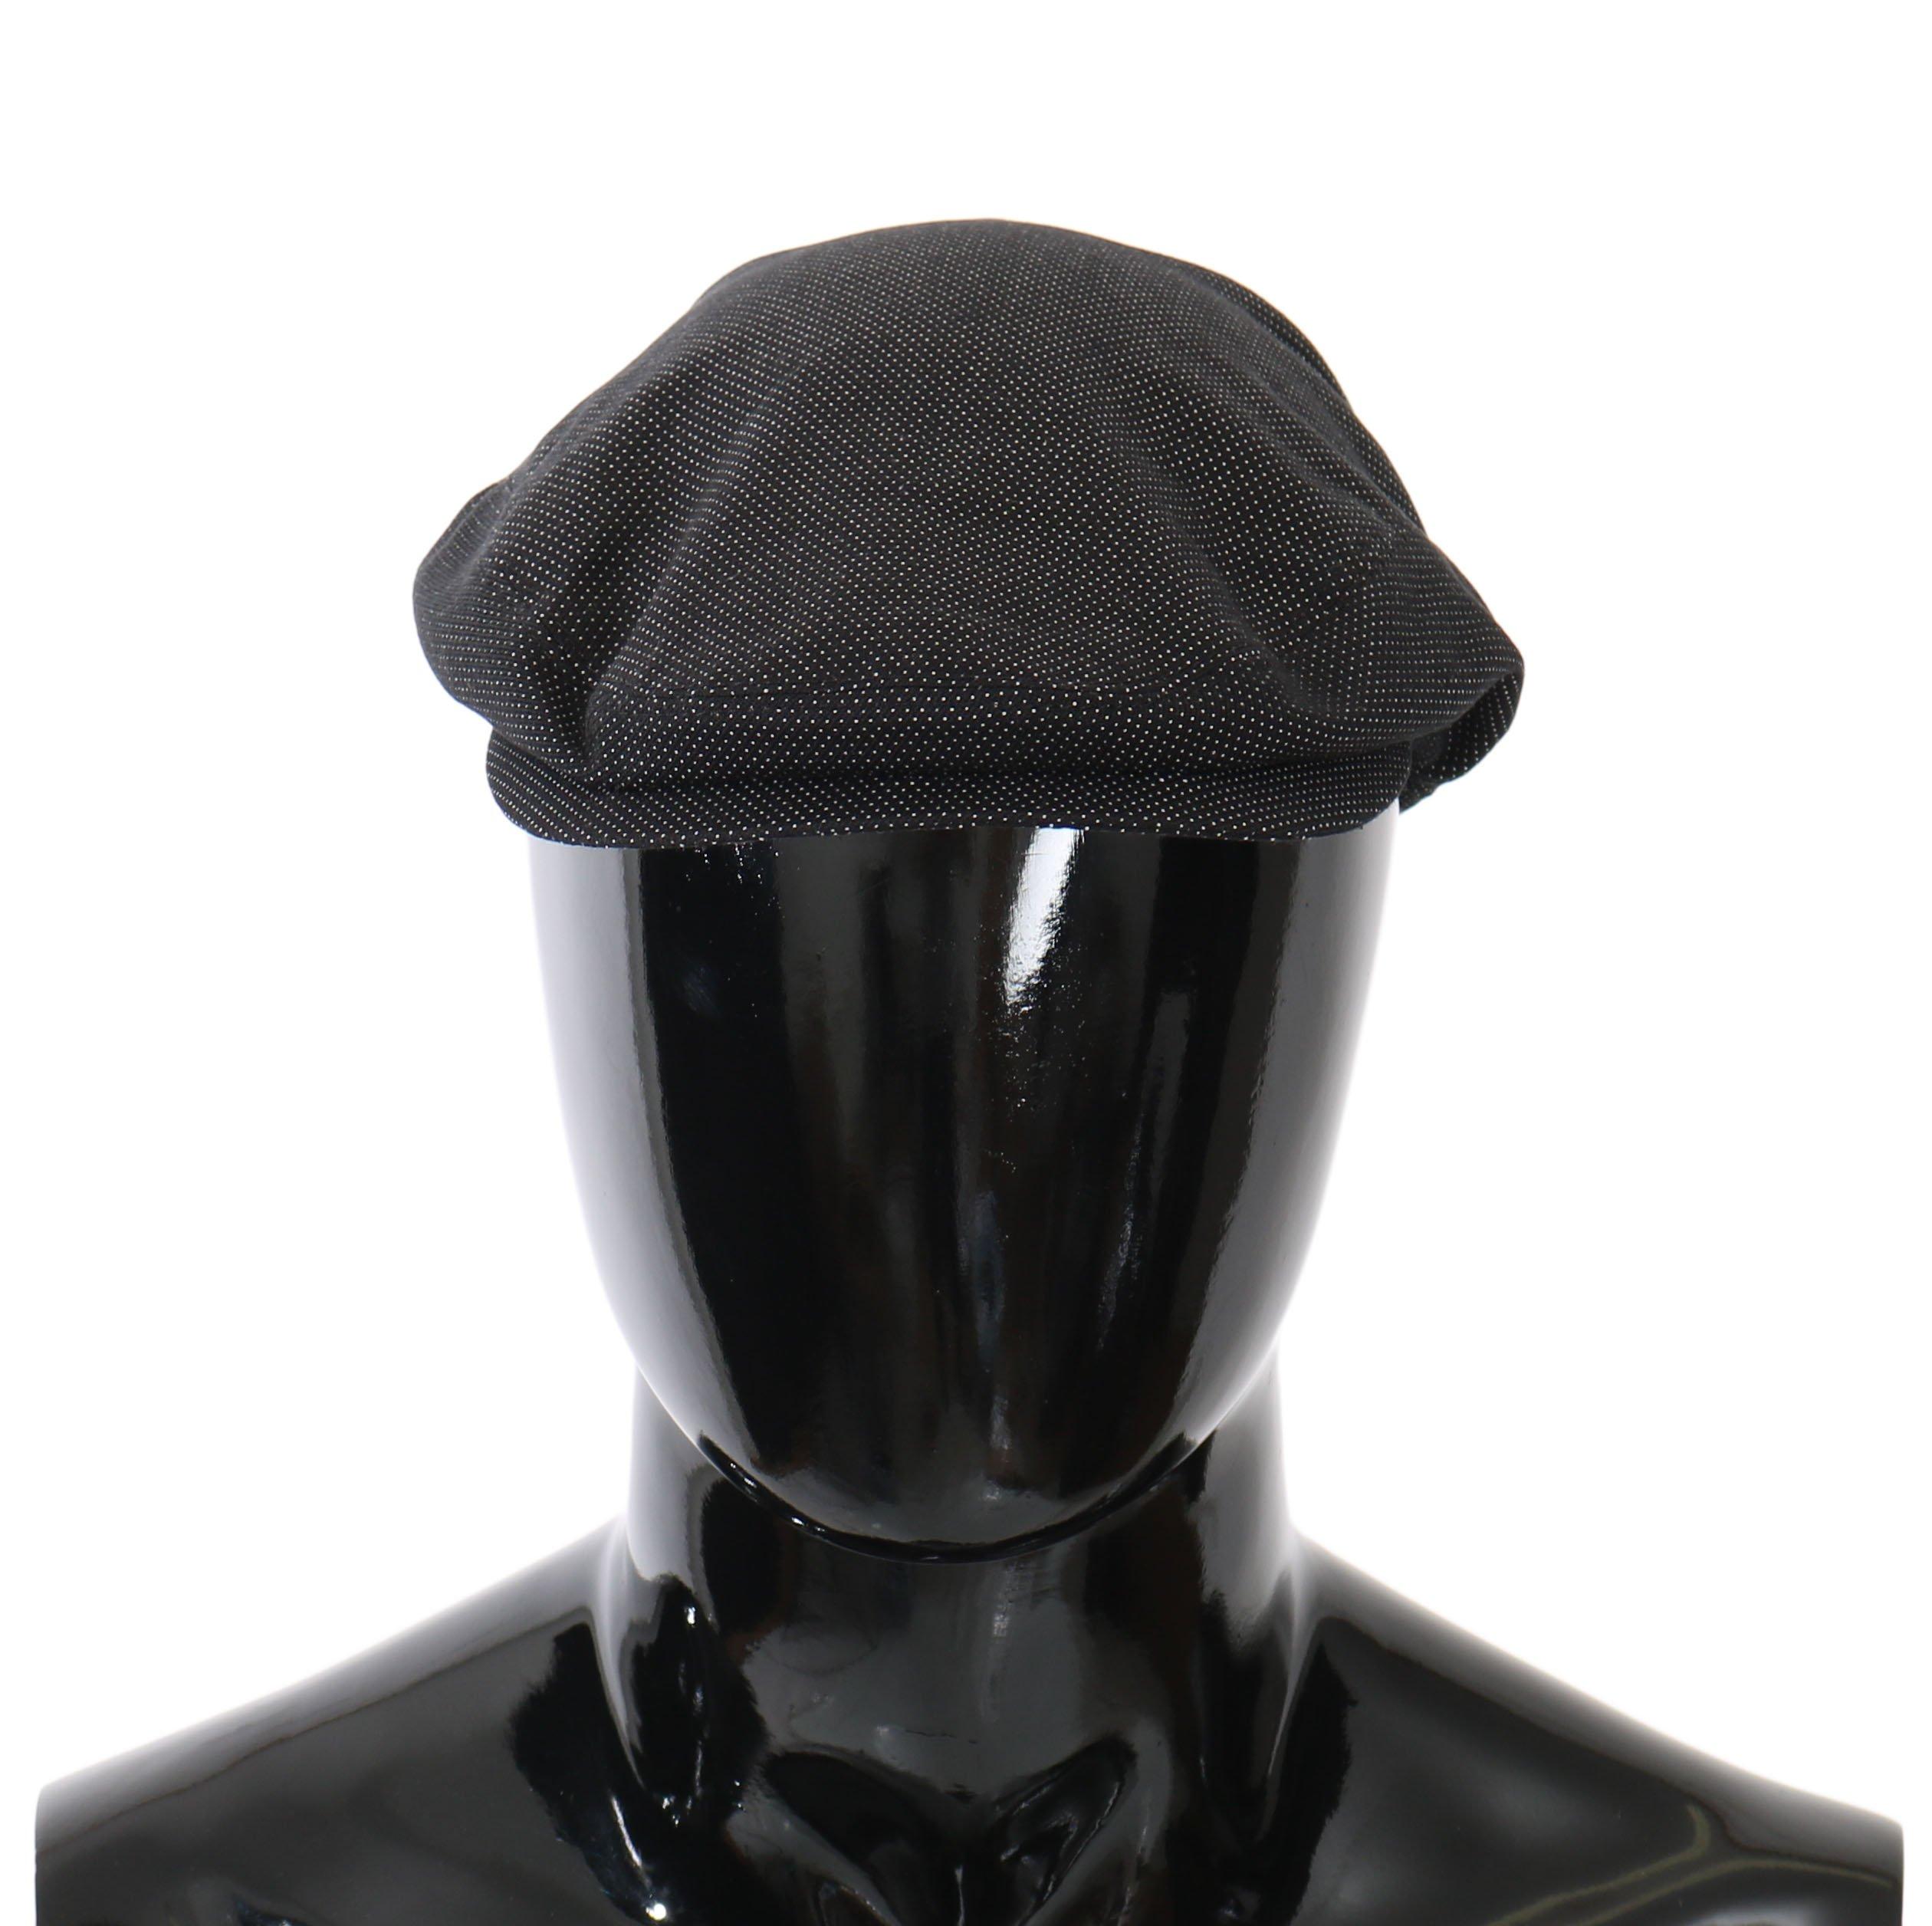 Dolce & Gabbana Men's Dotted Crown Logo Newsboy Capello Hat Black HAT81025 - 58 cm|M